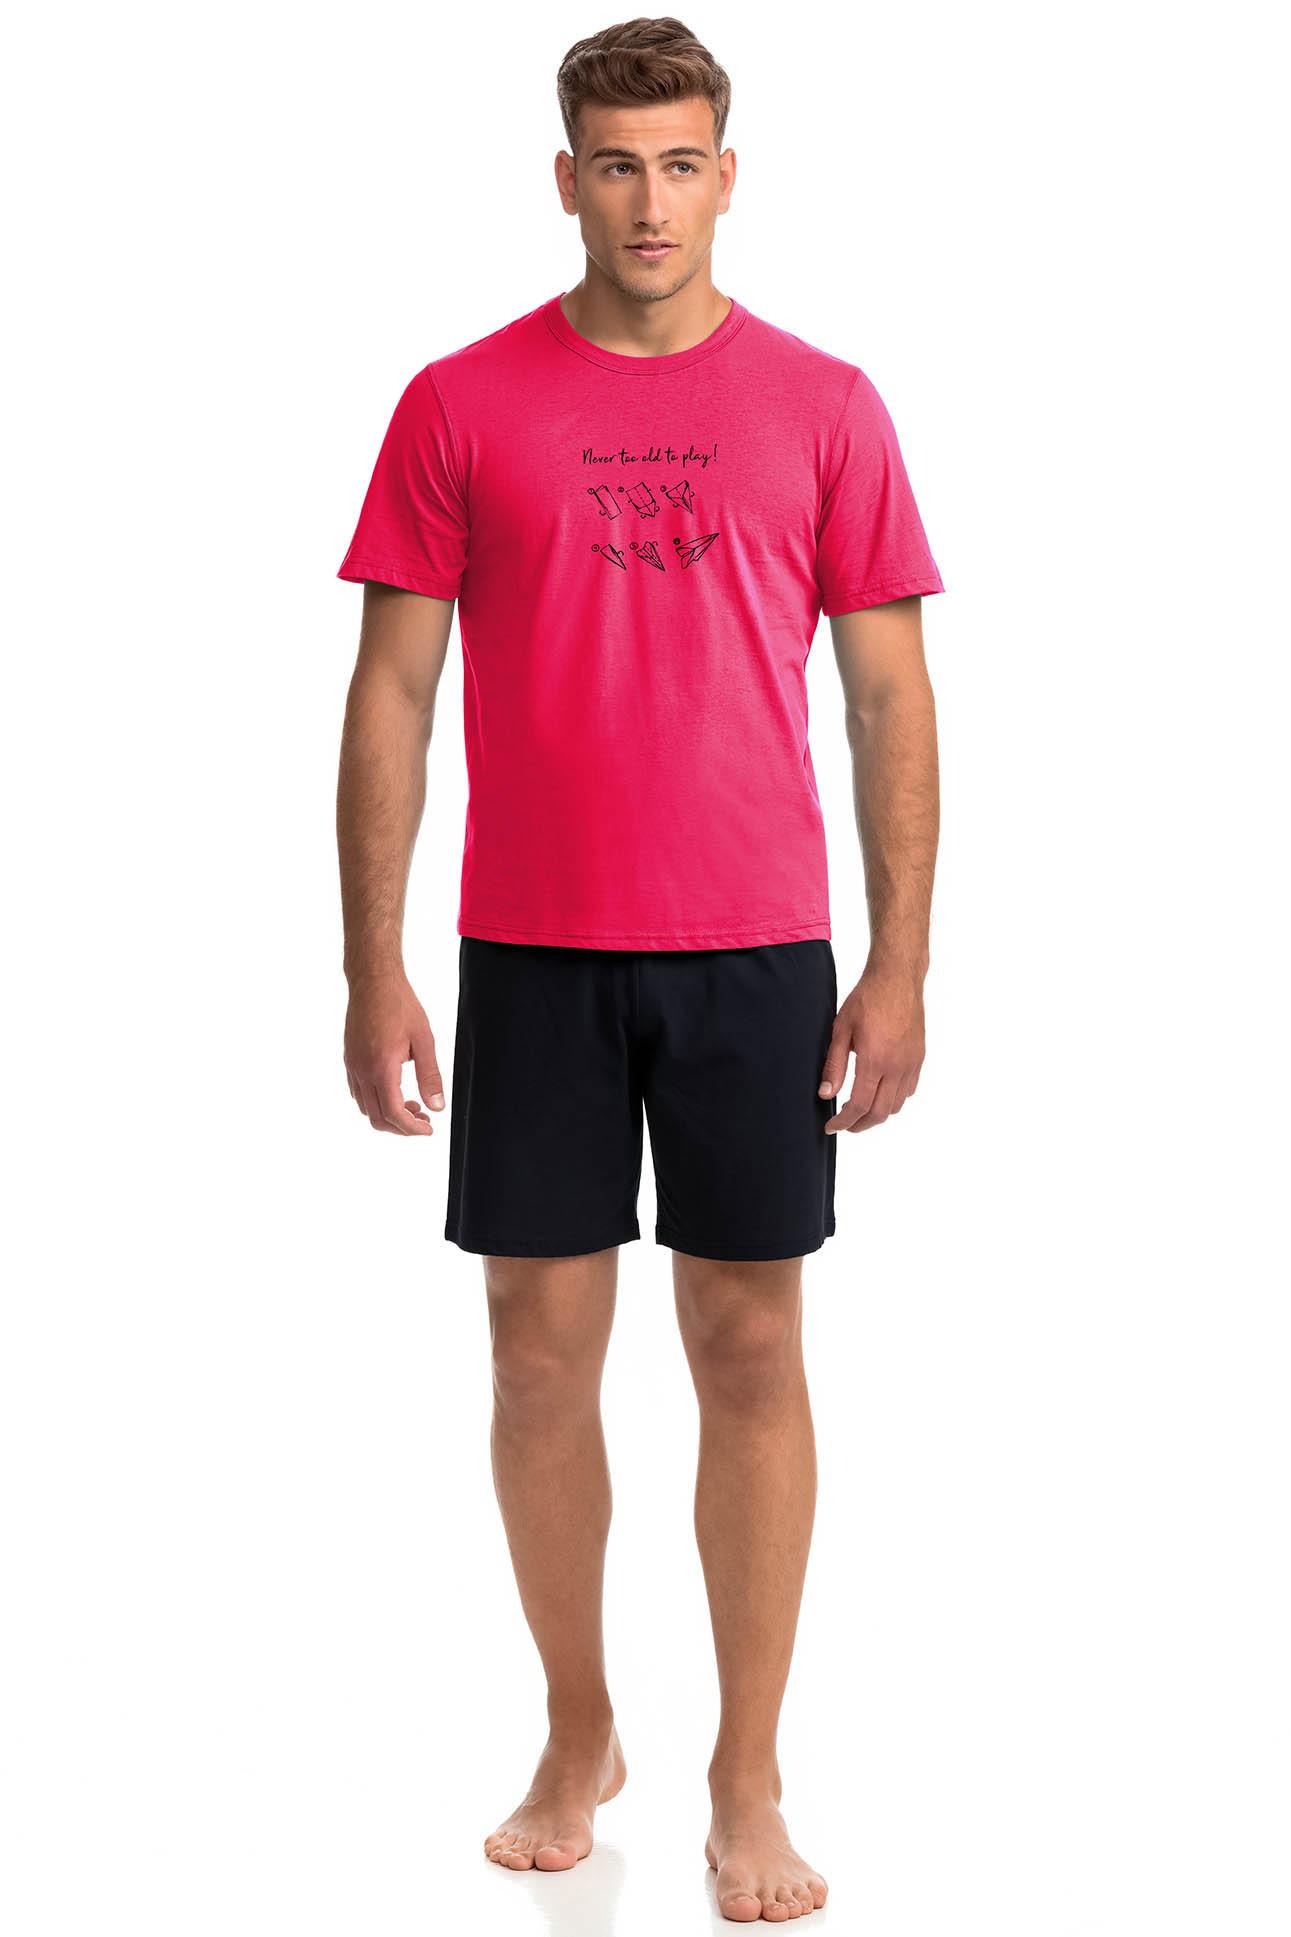 Vamp - Pohodlné dvoudílné pánské pyžamo POPPY RED XL 14935 - Vamp